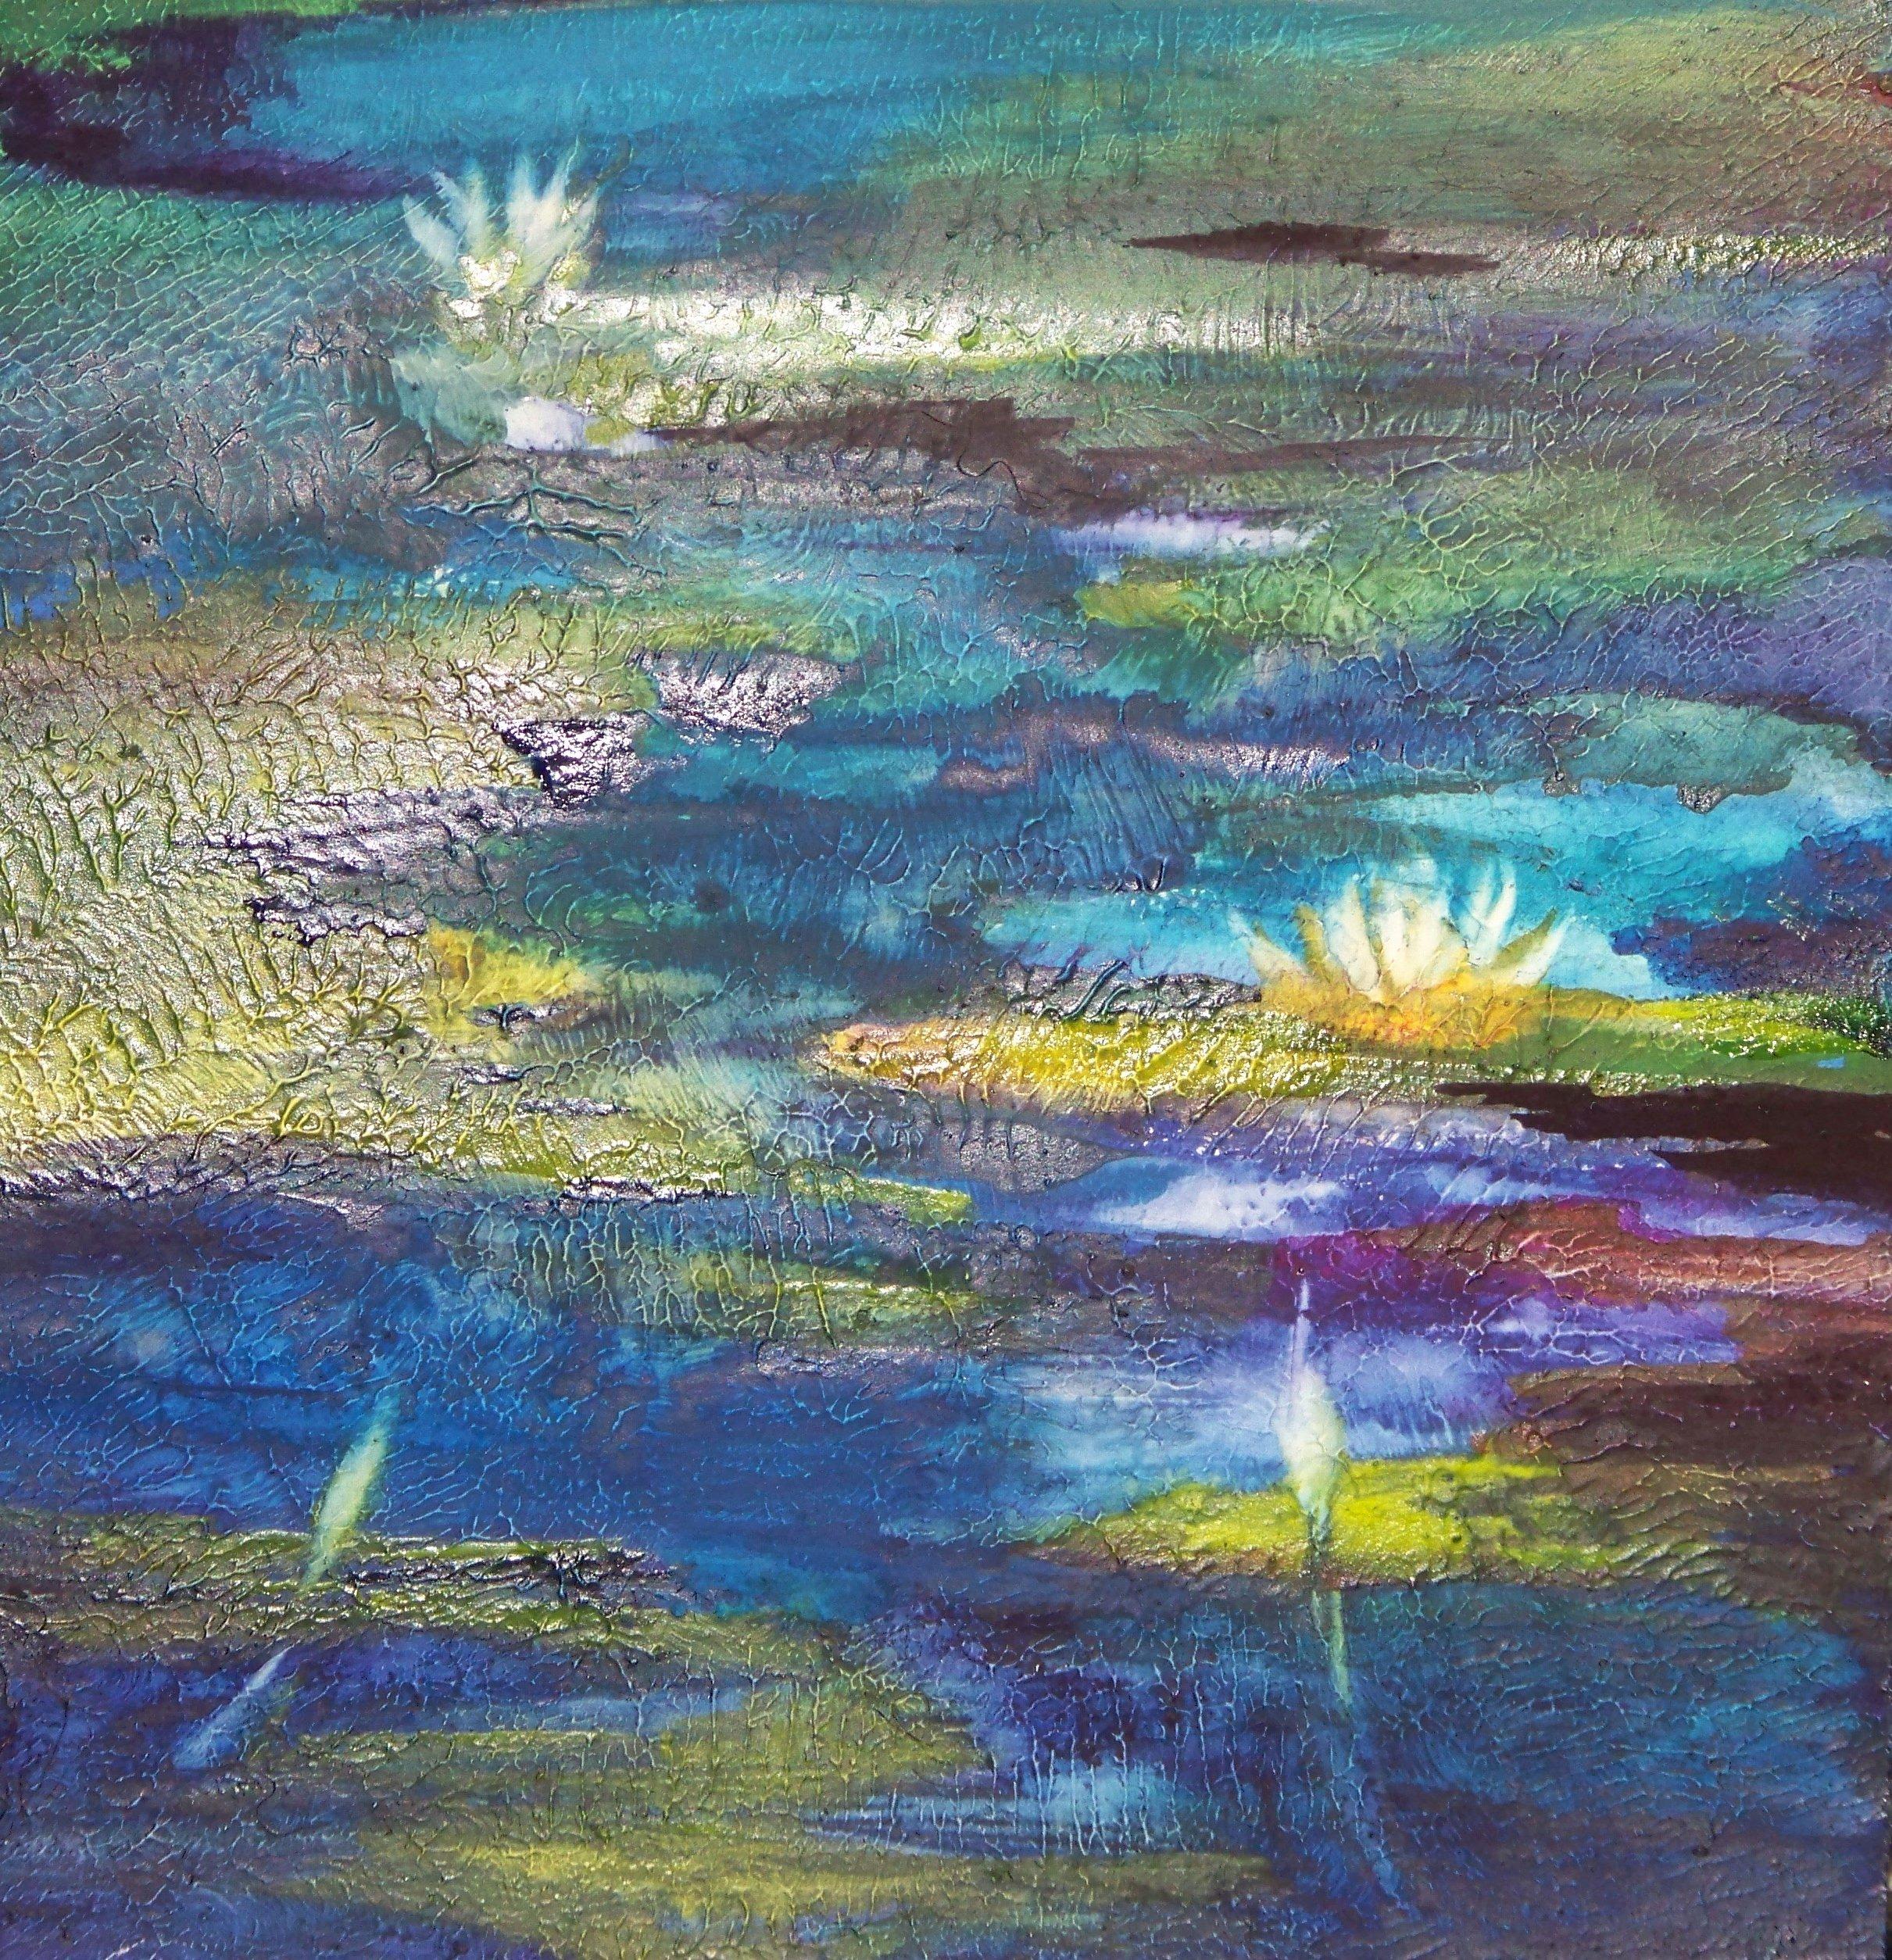 Monet Images Of Paintings Elegant Monet